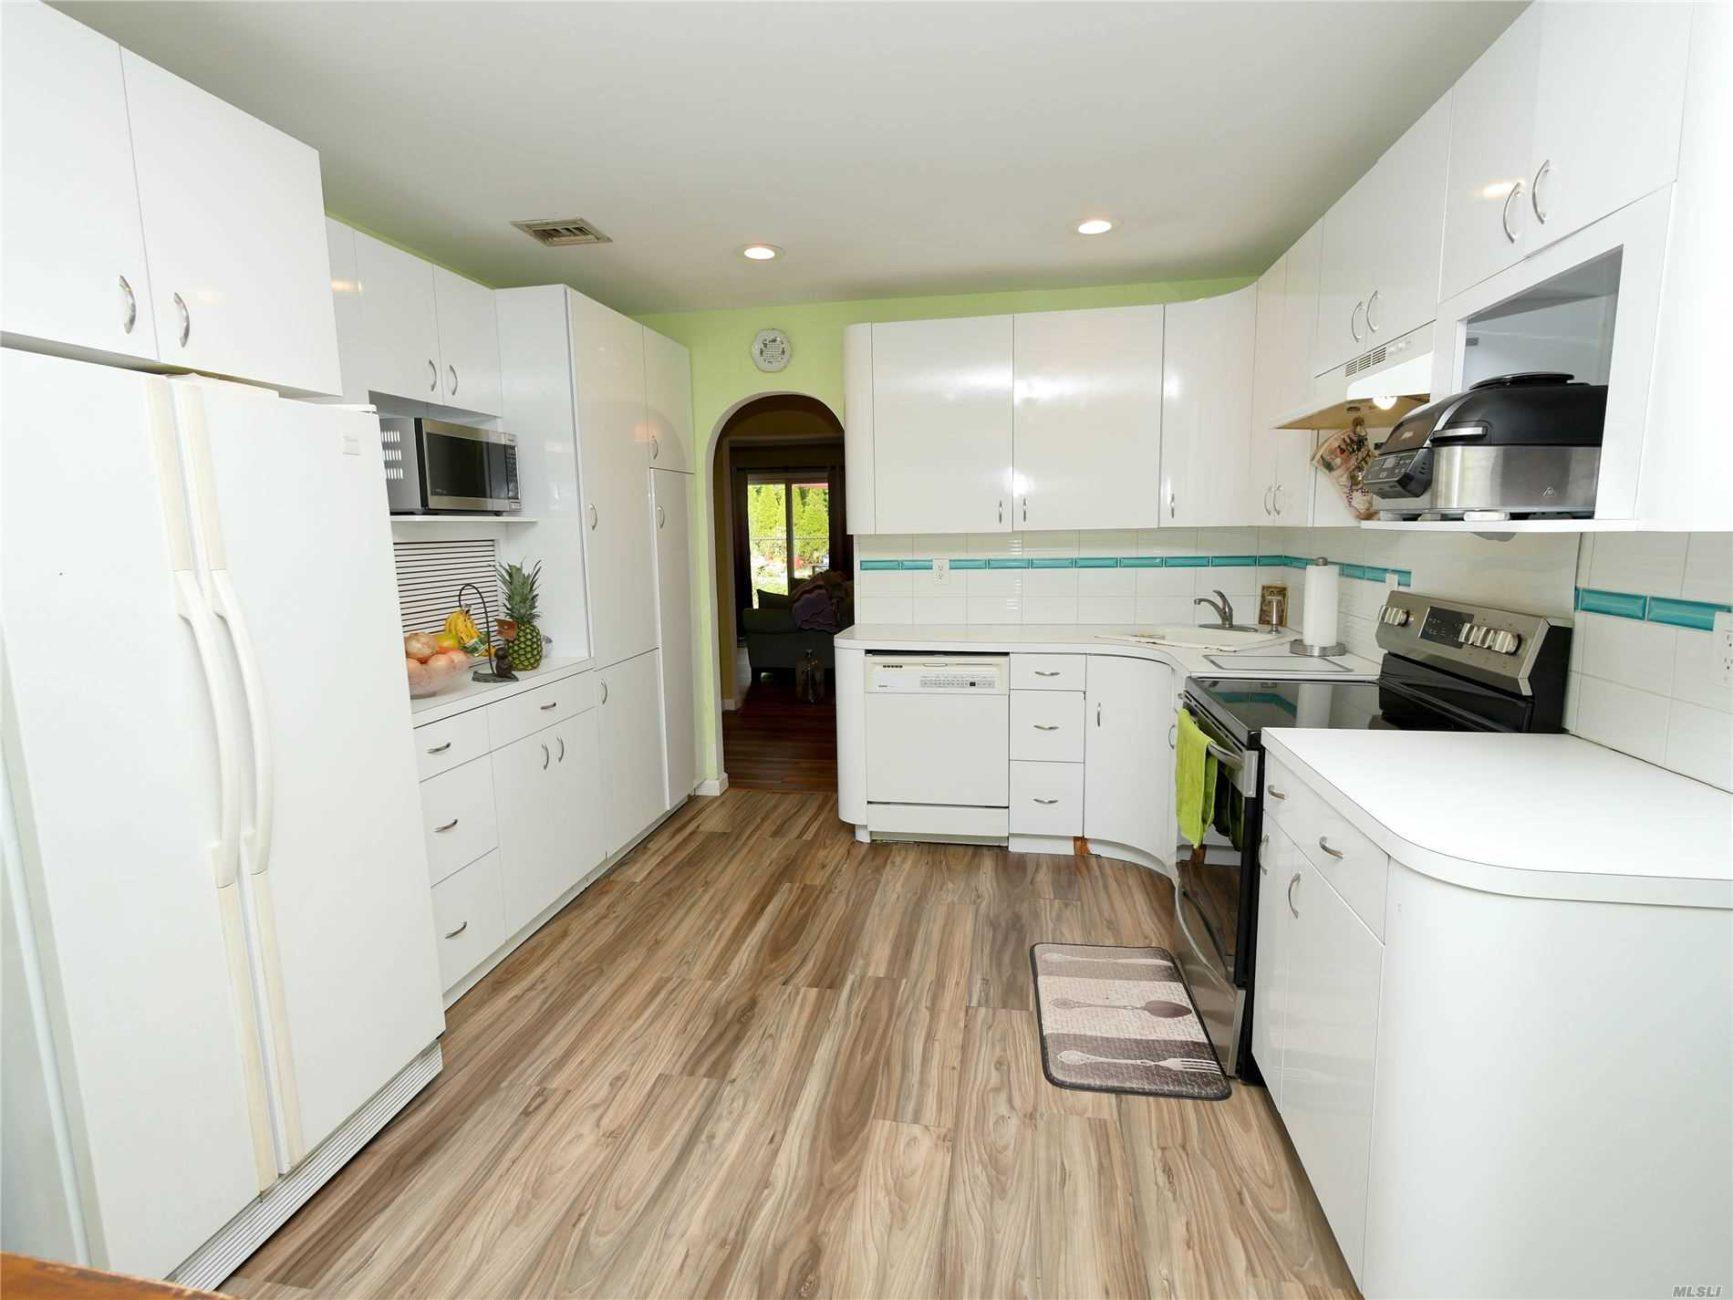 85 Strathmore Village Drive. Sout Setauket, NY 11720